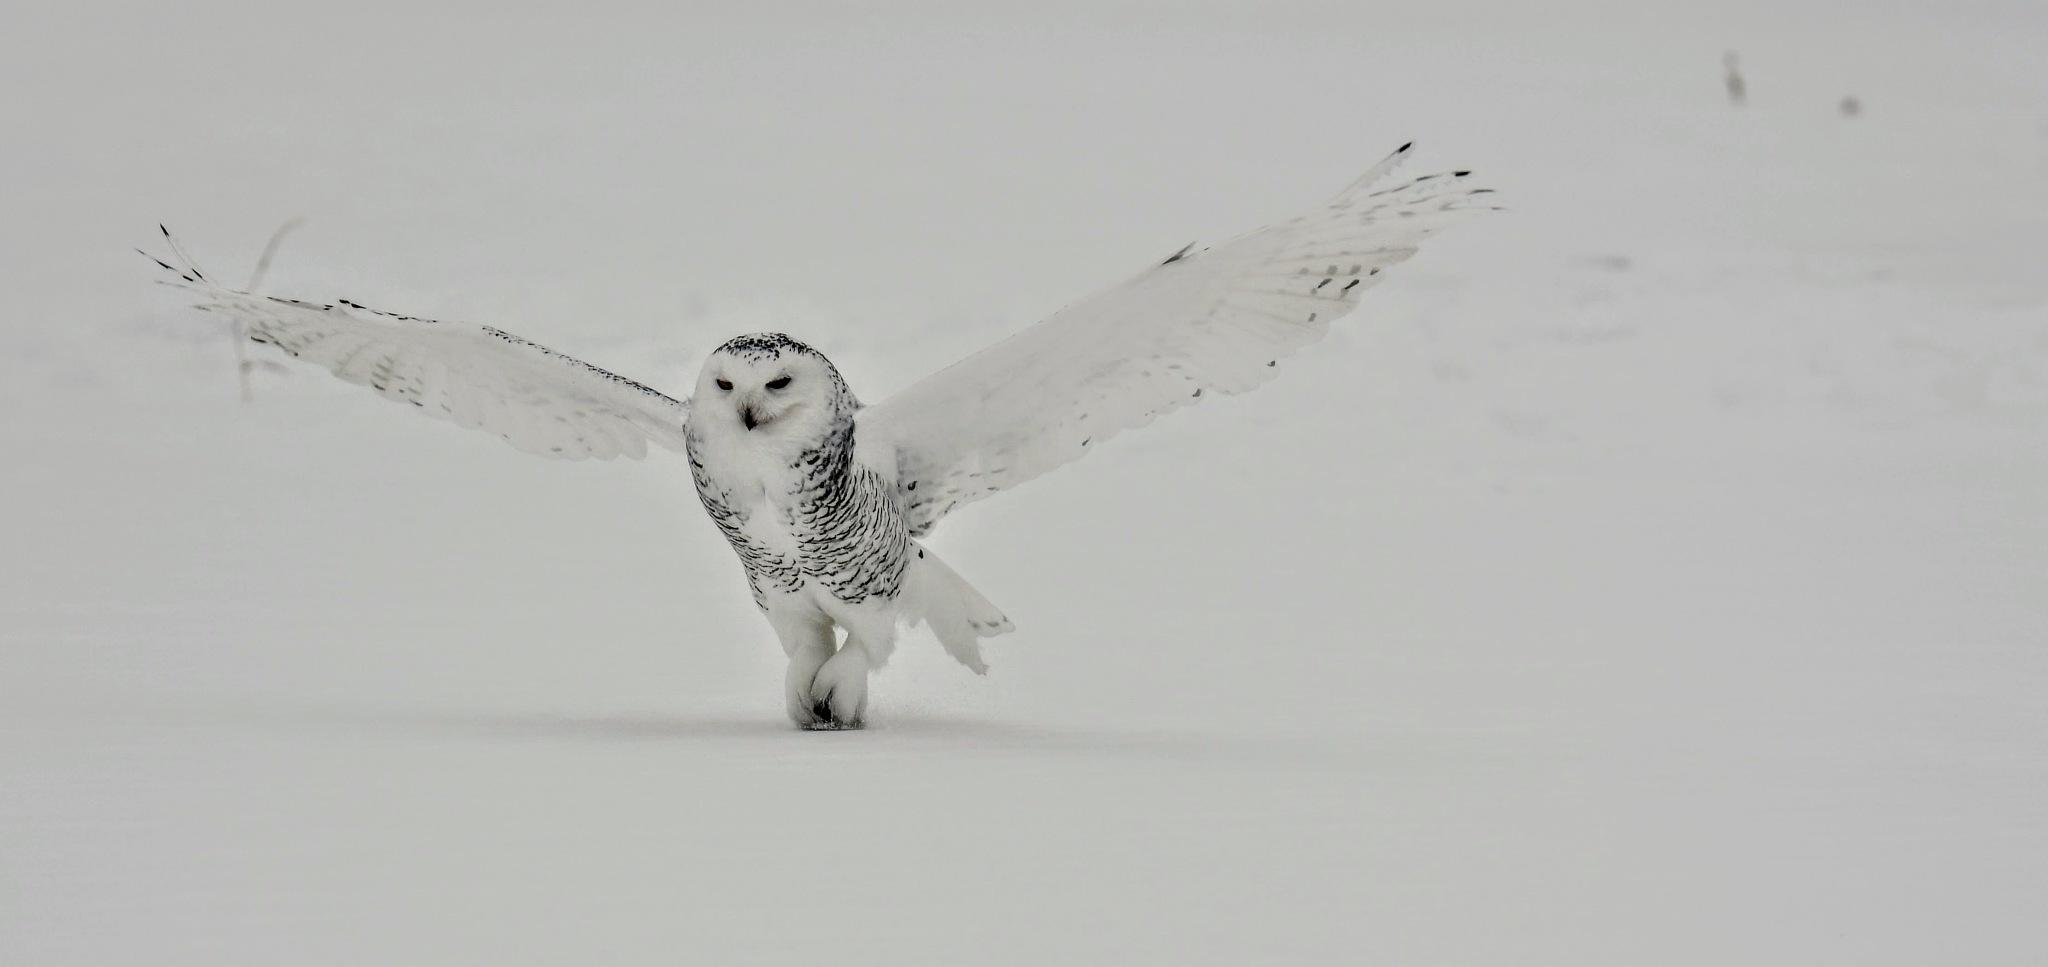 Female Snowy Owl by Simon Dadouche